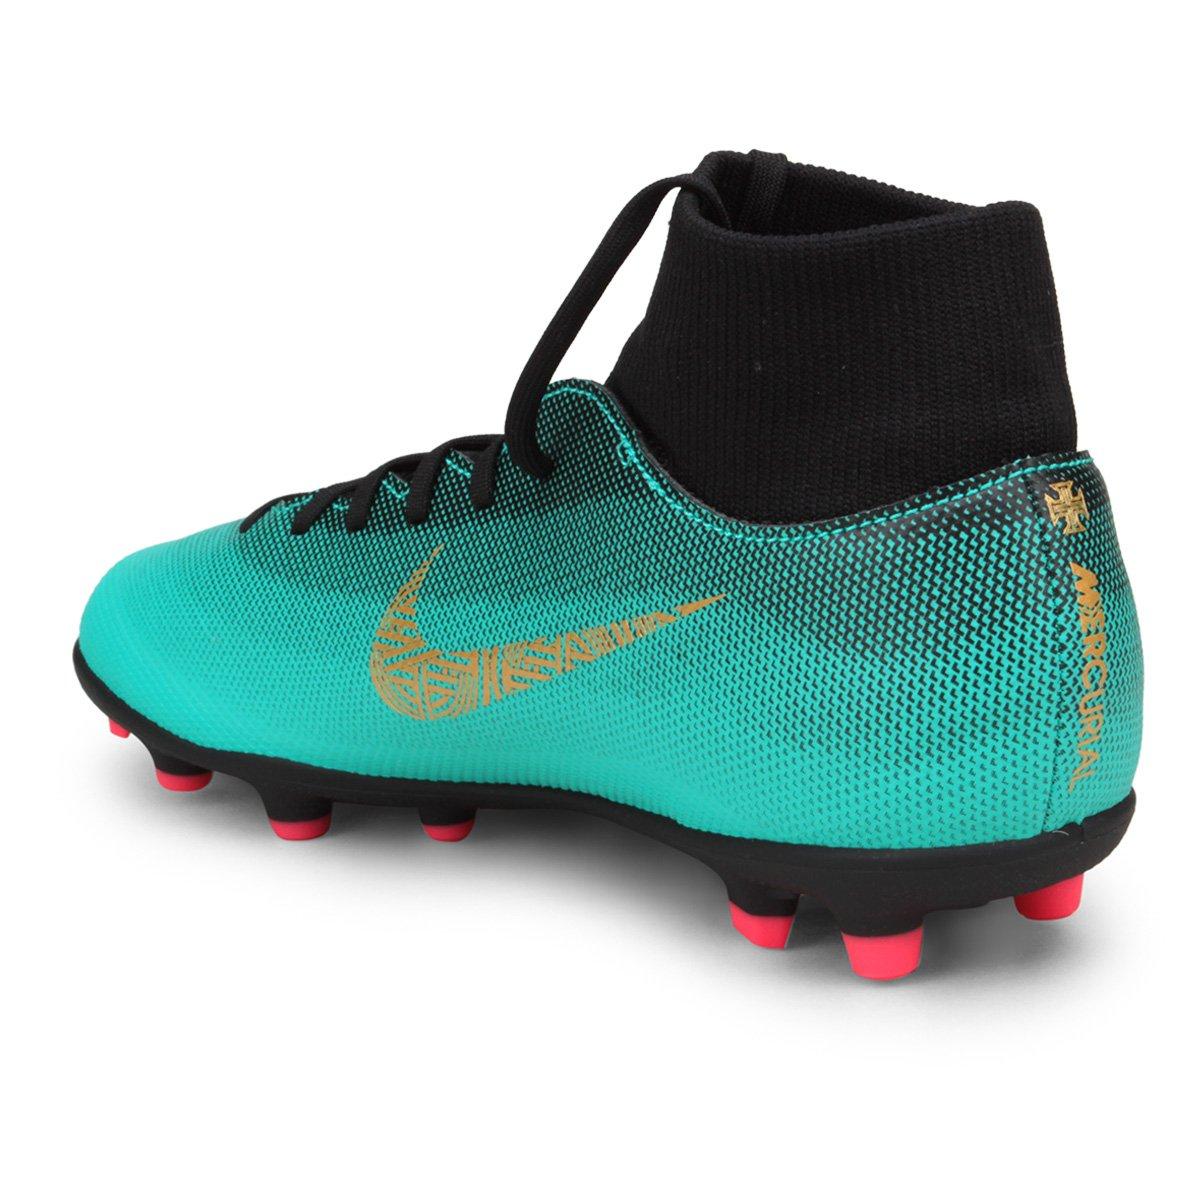 Chuteira Campo Nike Mercurial Superfly 6 Club CR7 MG - Verde água ... ba9ec53e2138a